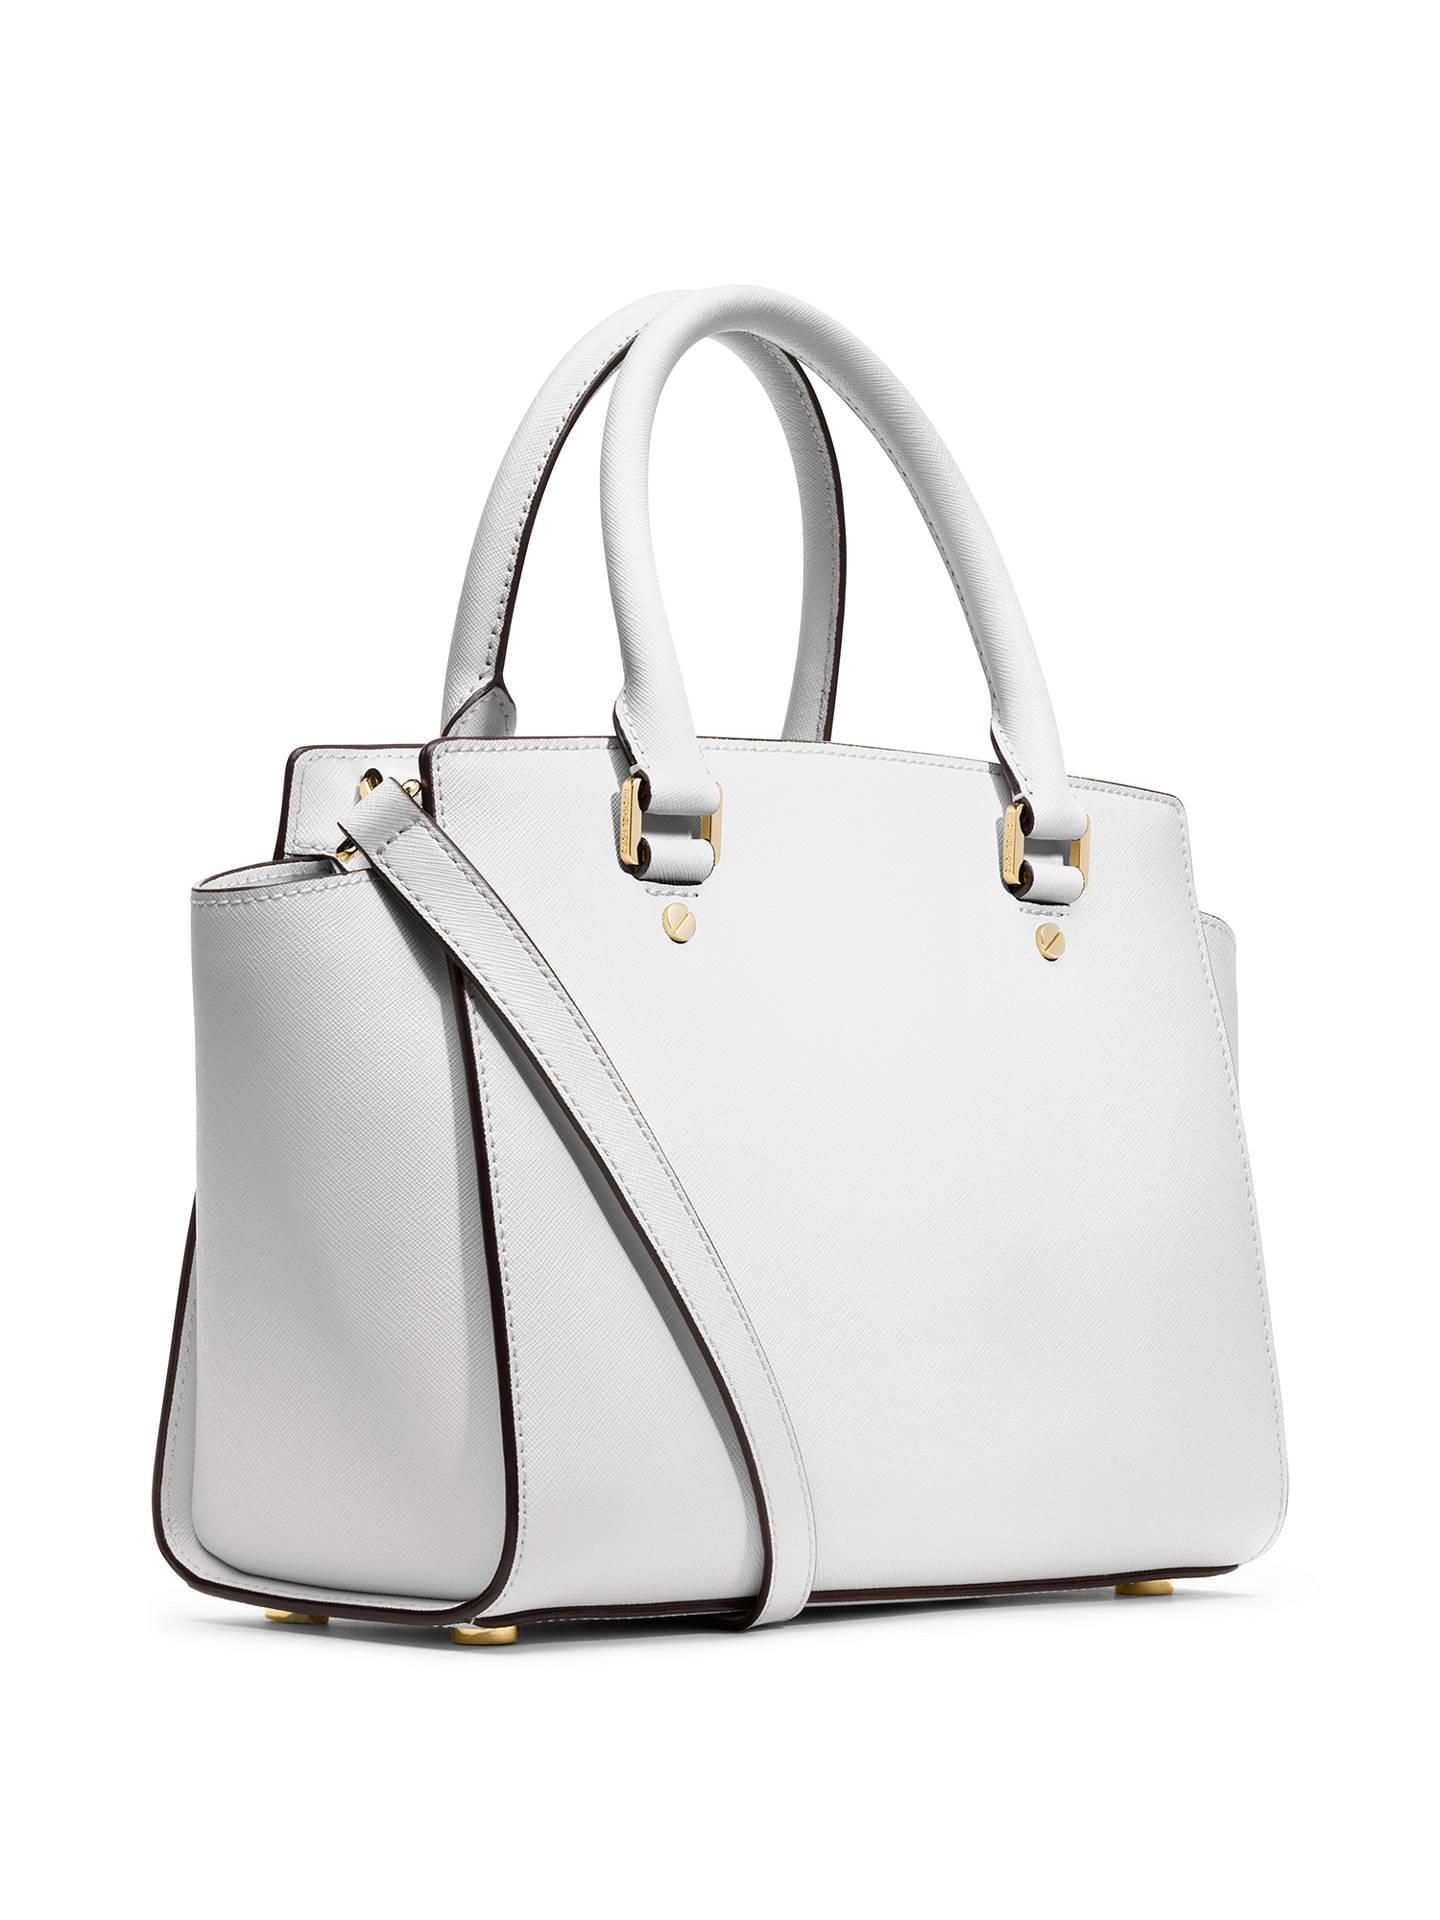 41deee237a007 Buy MICHAEL Michael Kors Selma Saffiano Medium Leather Satchel